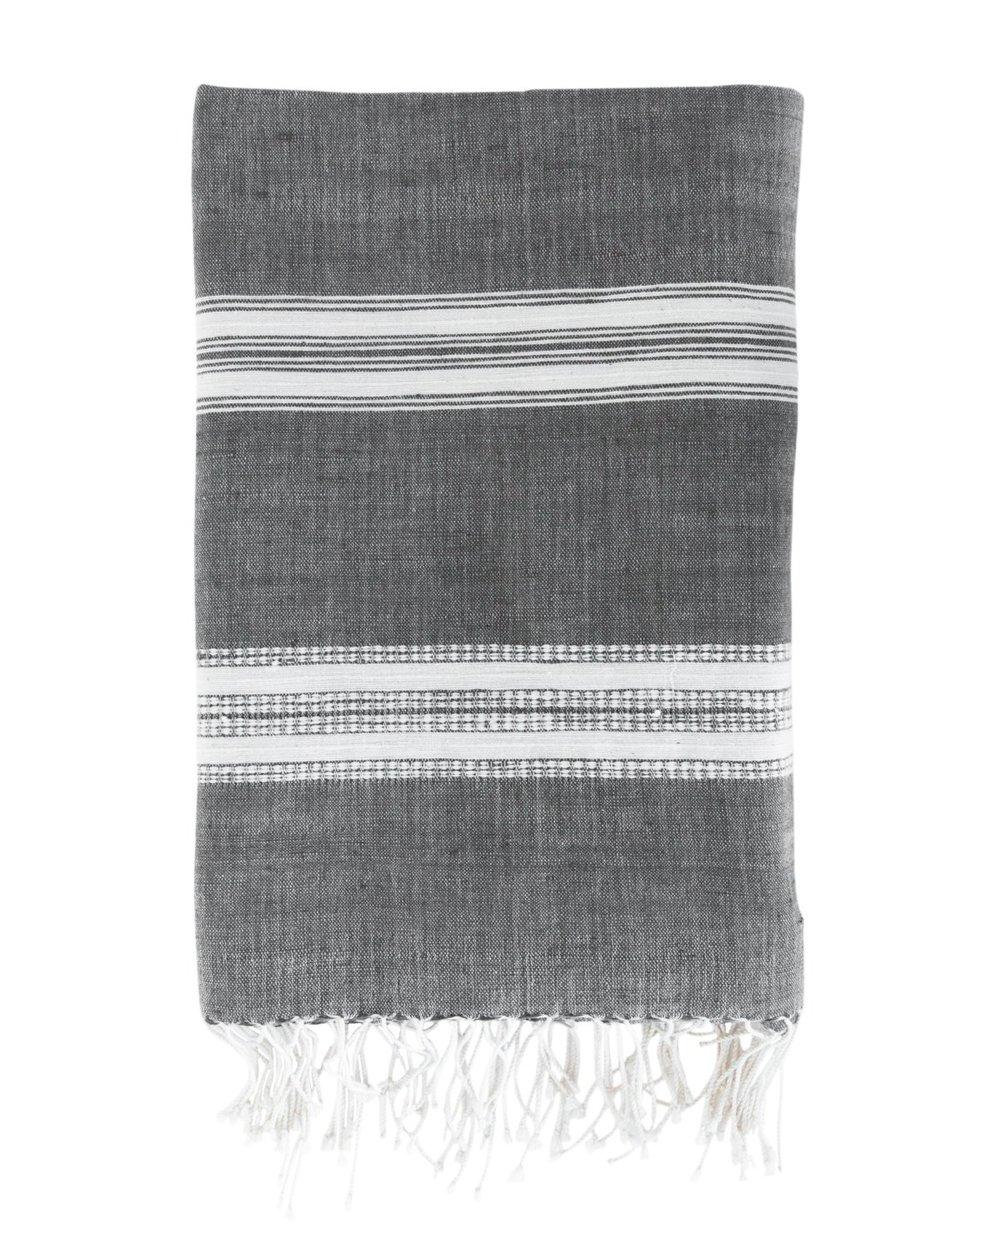 Coronado_Bath_Towel_8.jpg